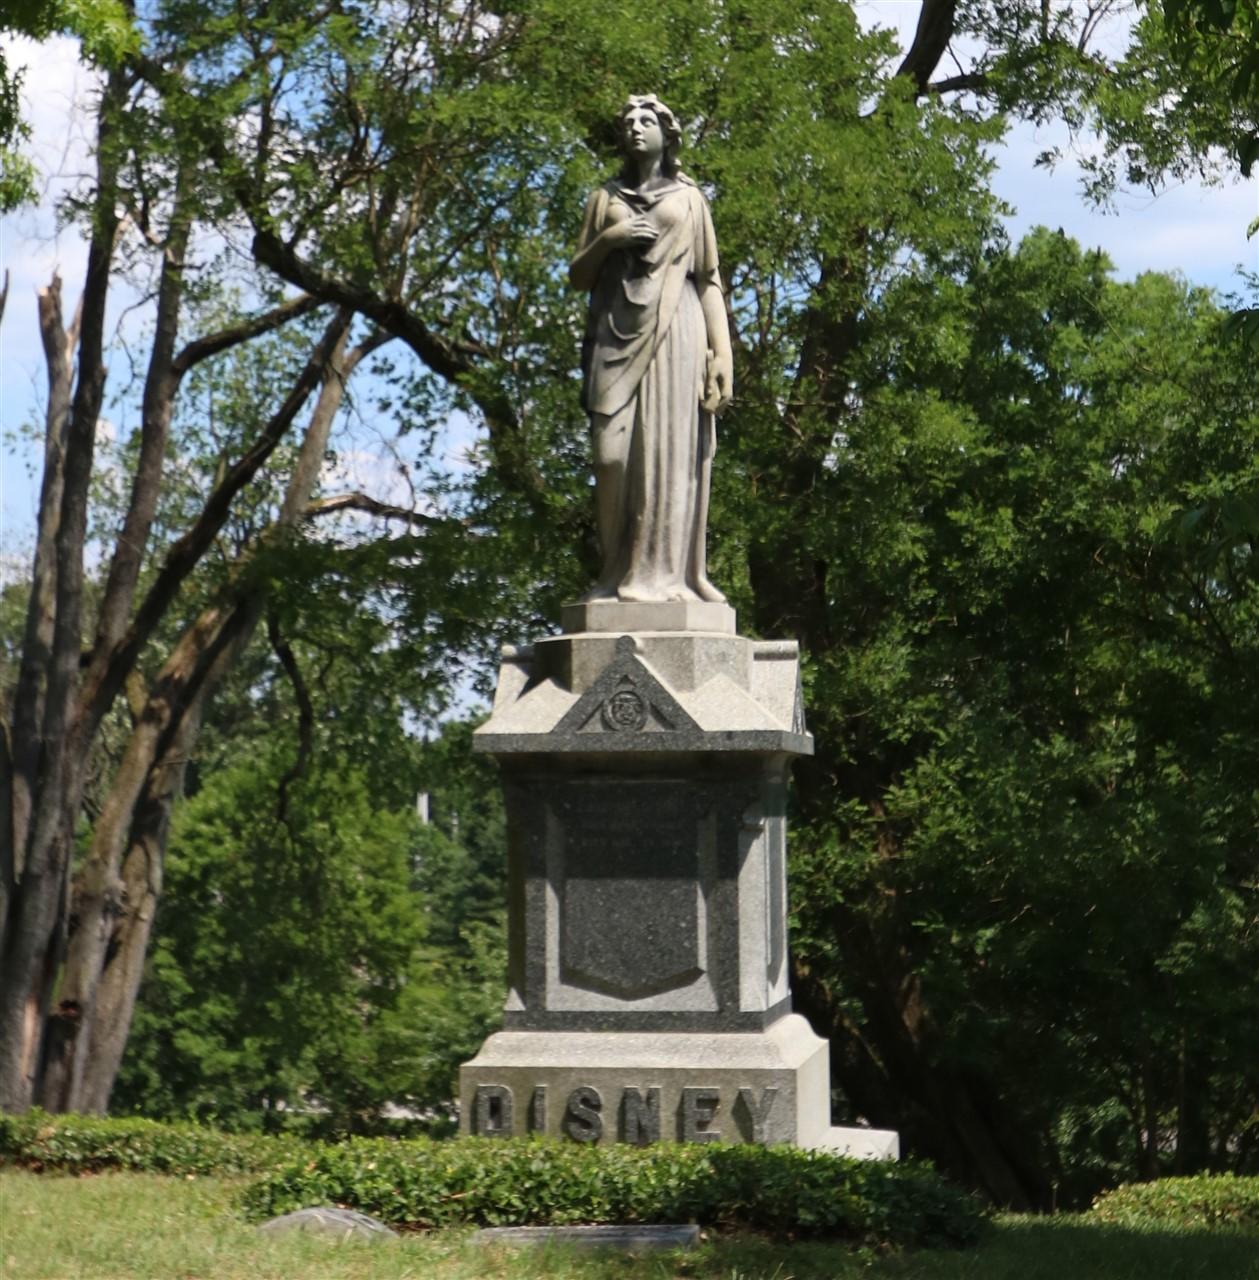 2017 06 11 202 Cincinnati Spring Grove Cemetery & Arboretum.jpg